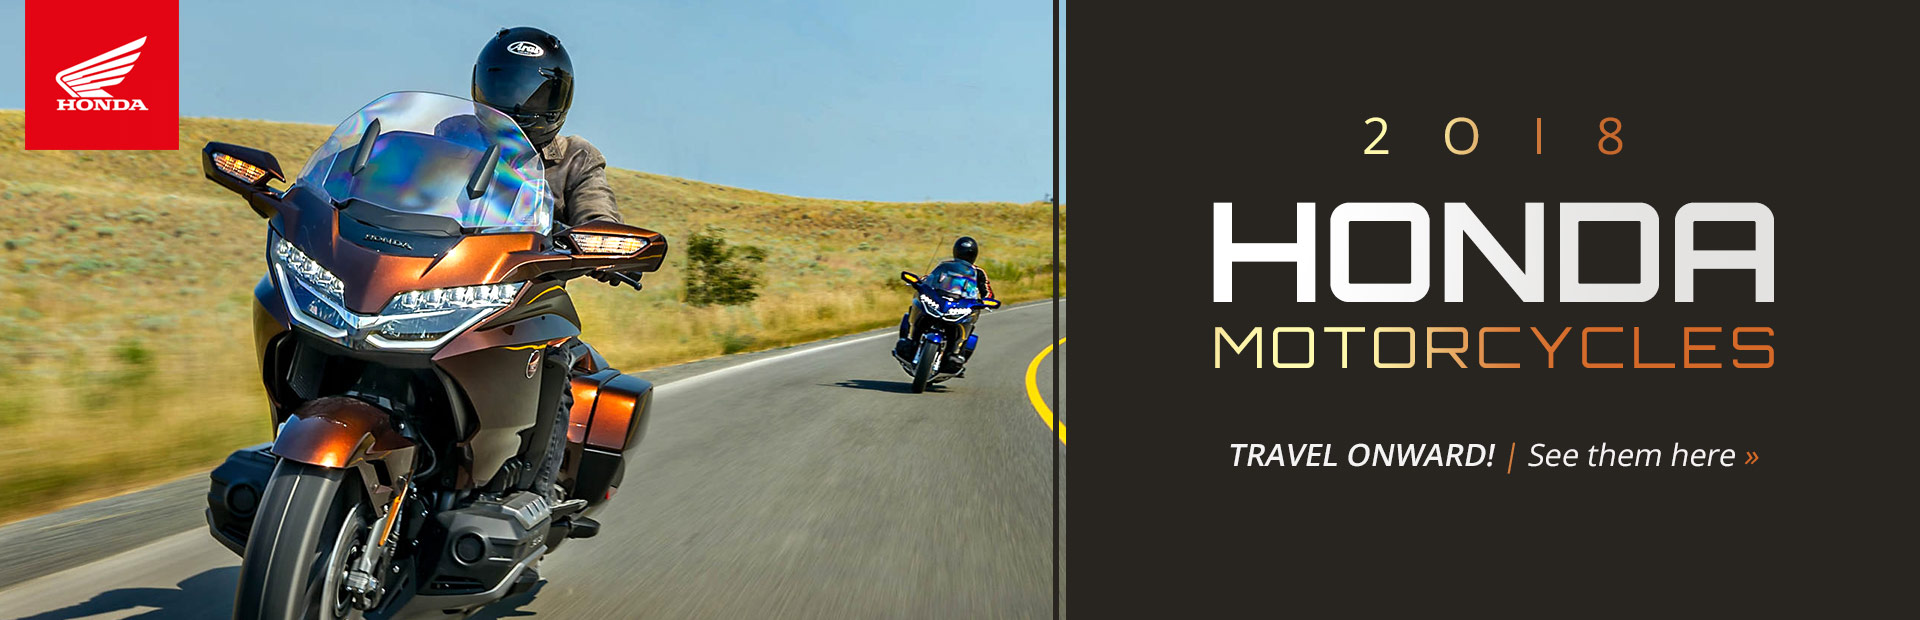 2018 Honda Motorcycles ...